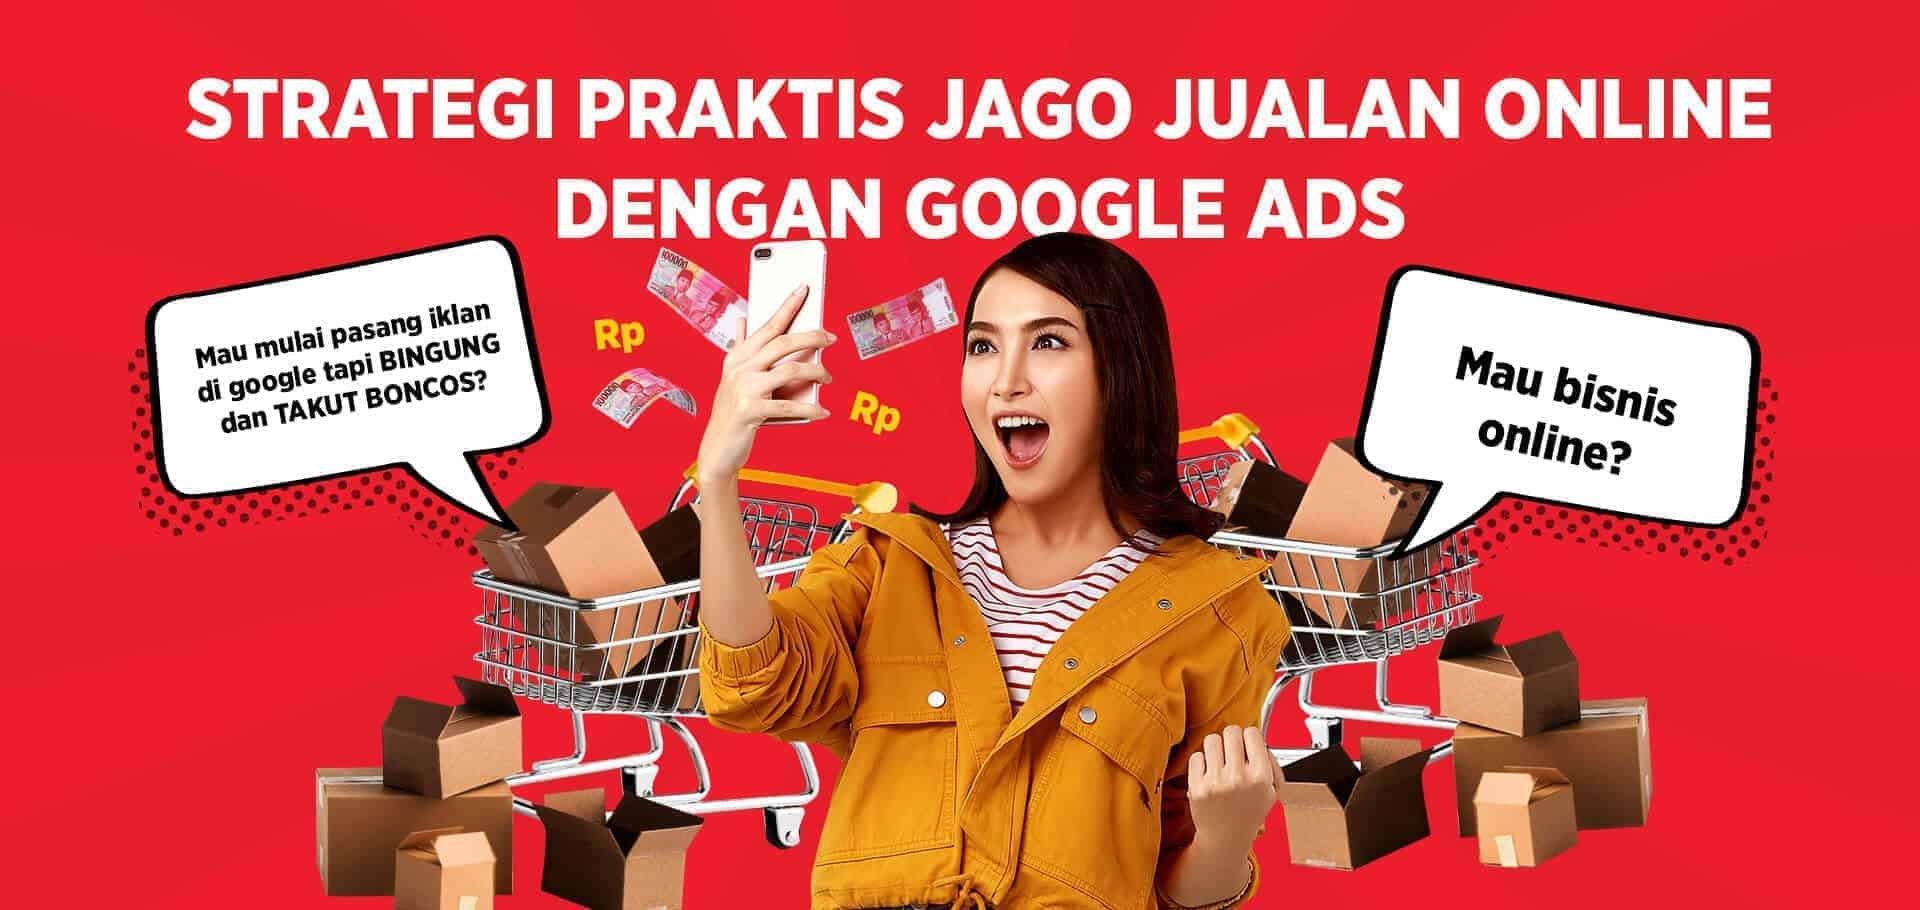 Strategi Praktis Jago Jualan Online Dengan Google Ads - Prakerja